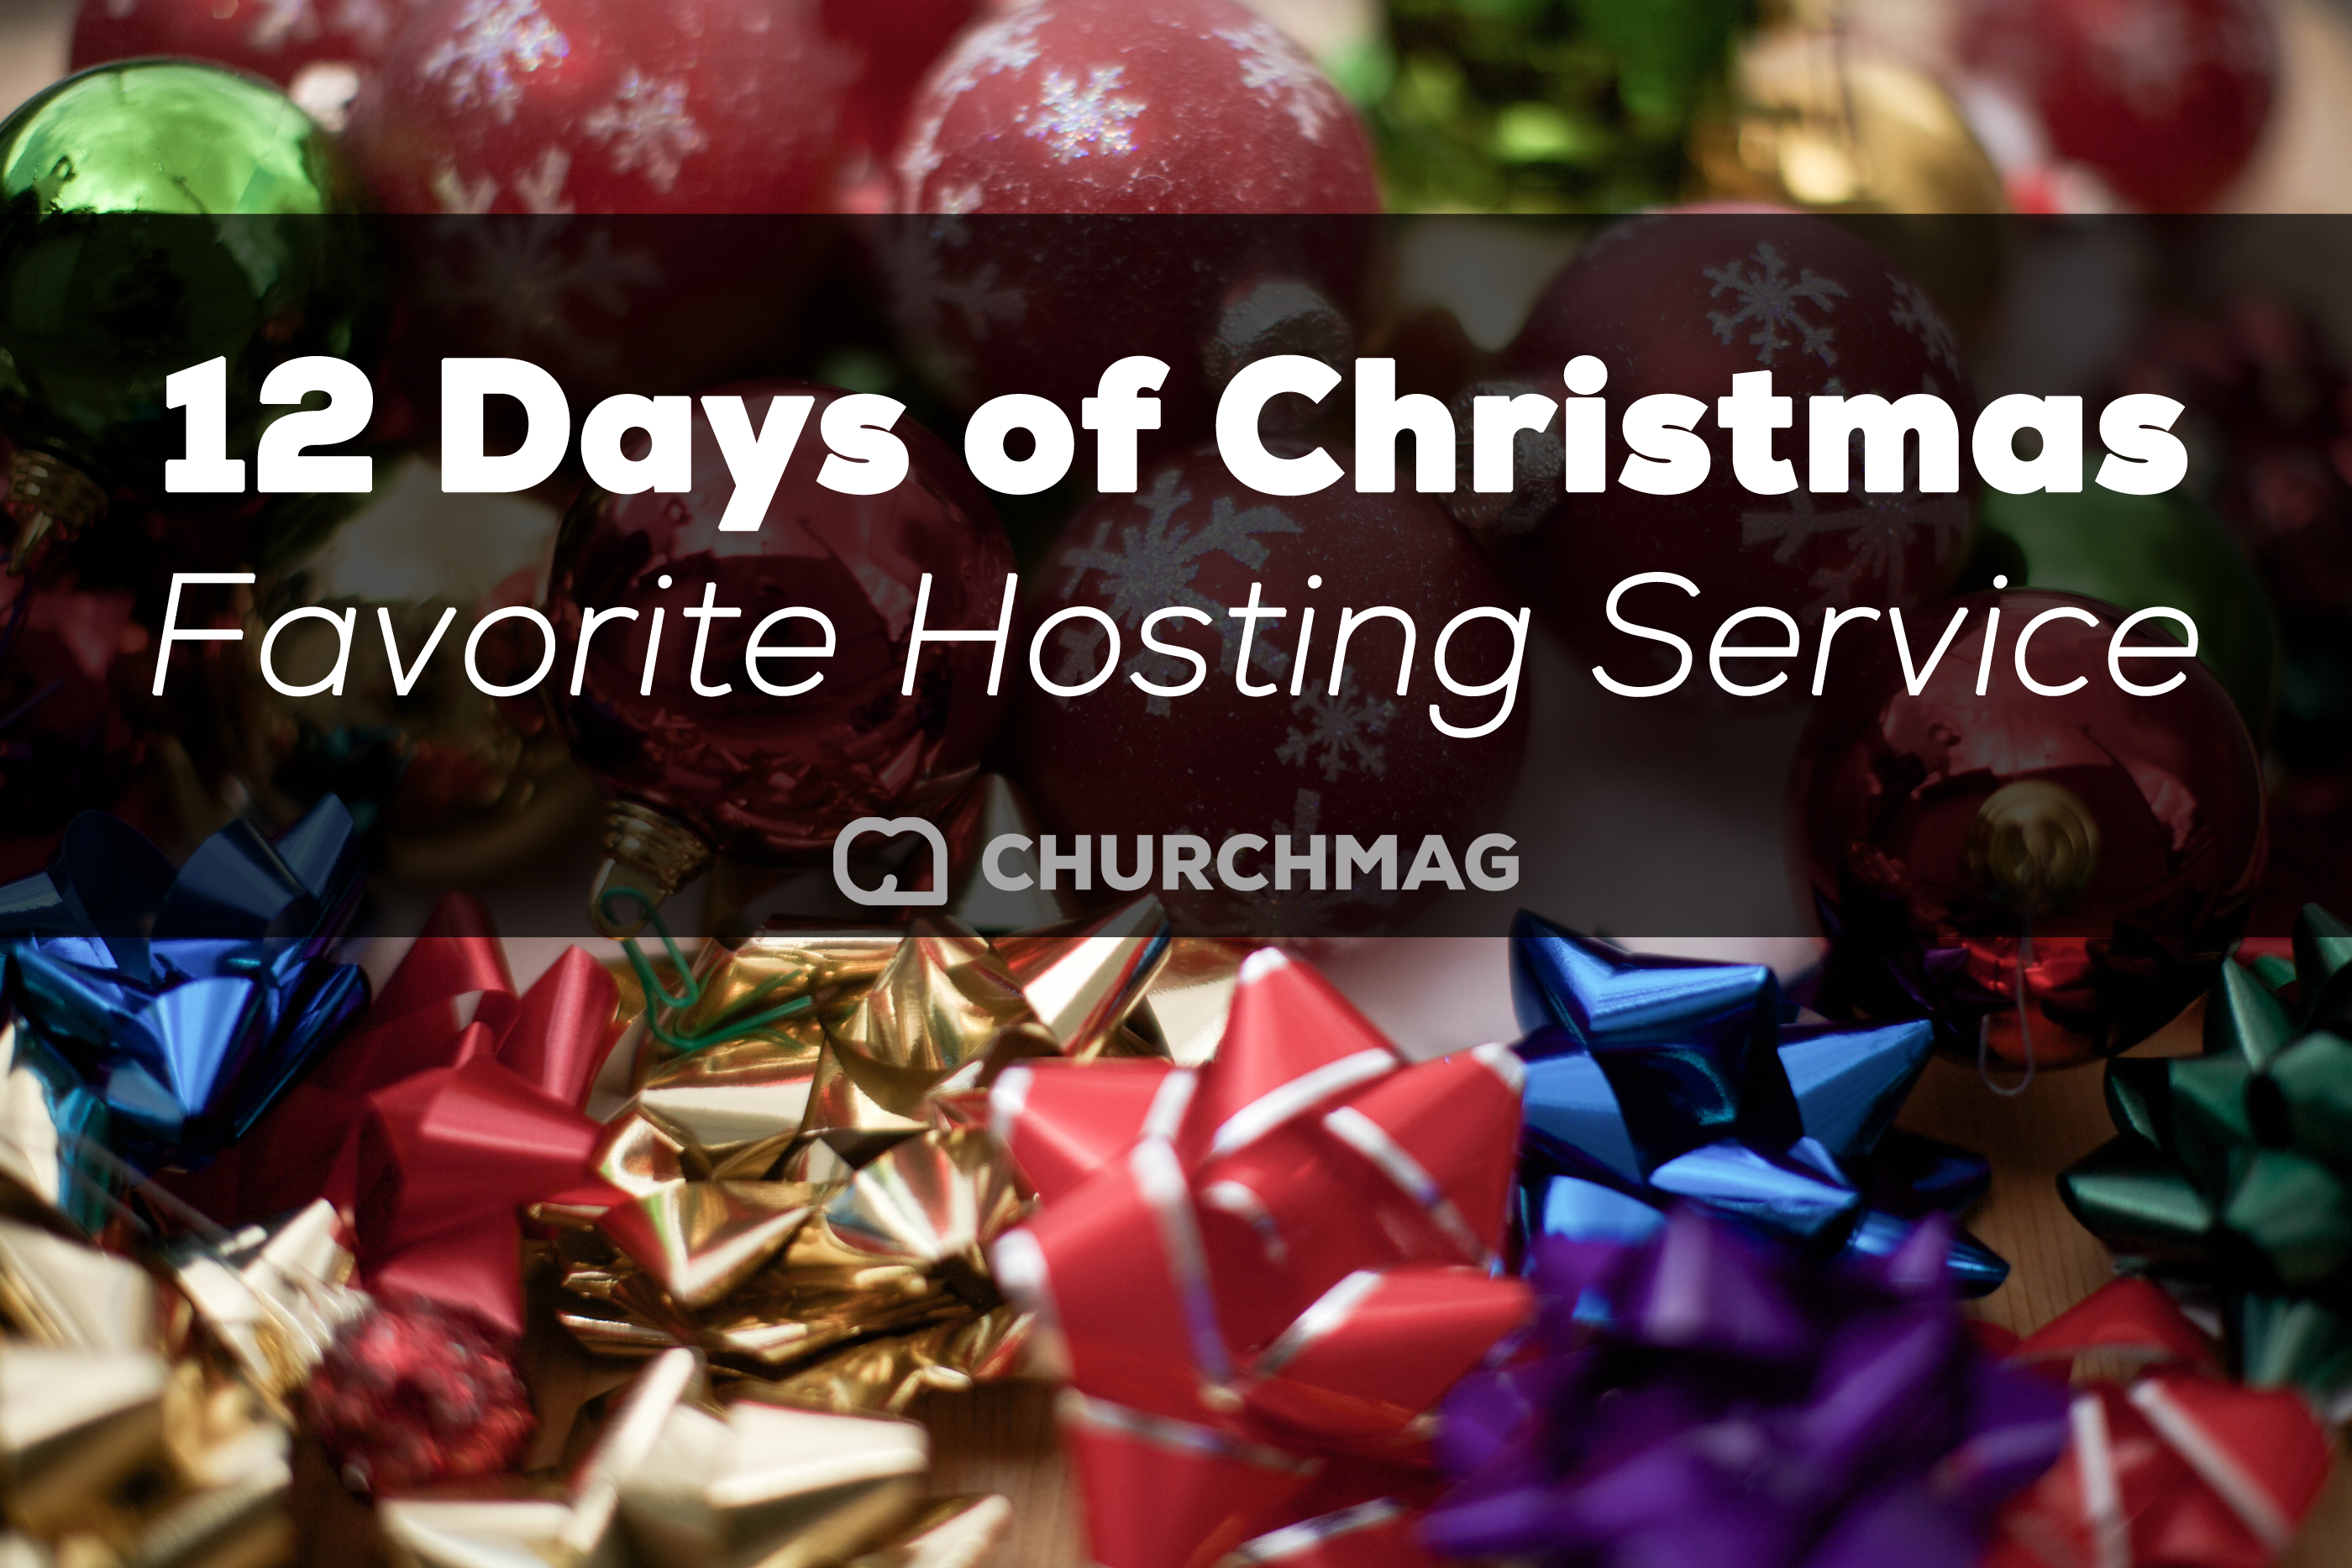 12 Days of Christmas: Favorite Hosting Service